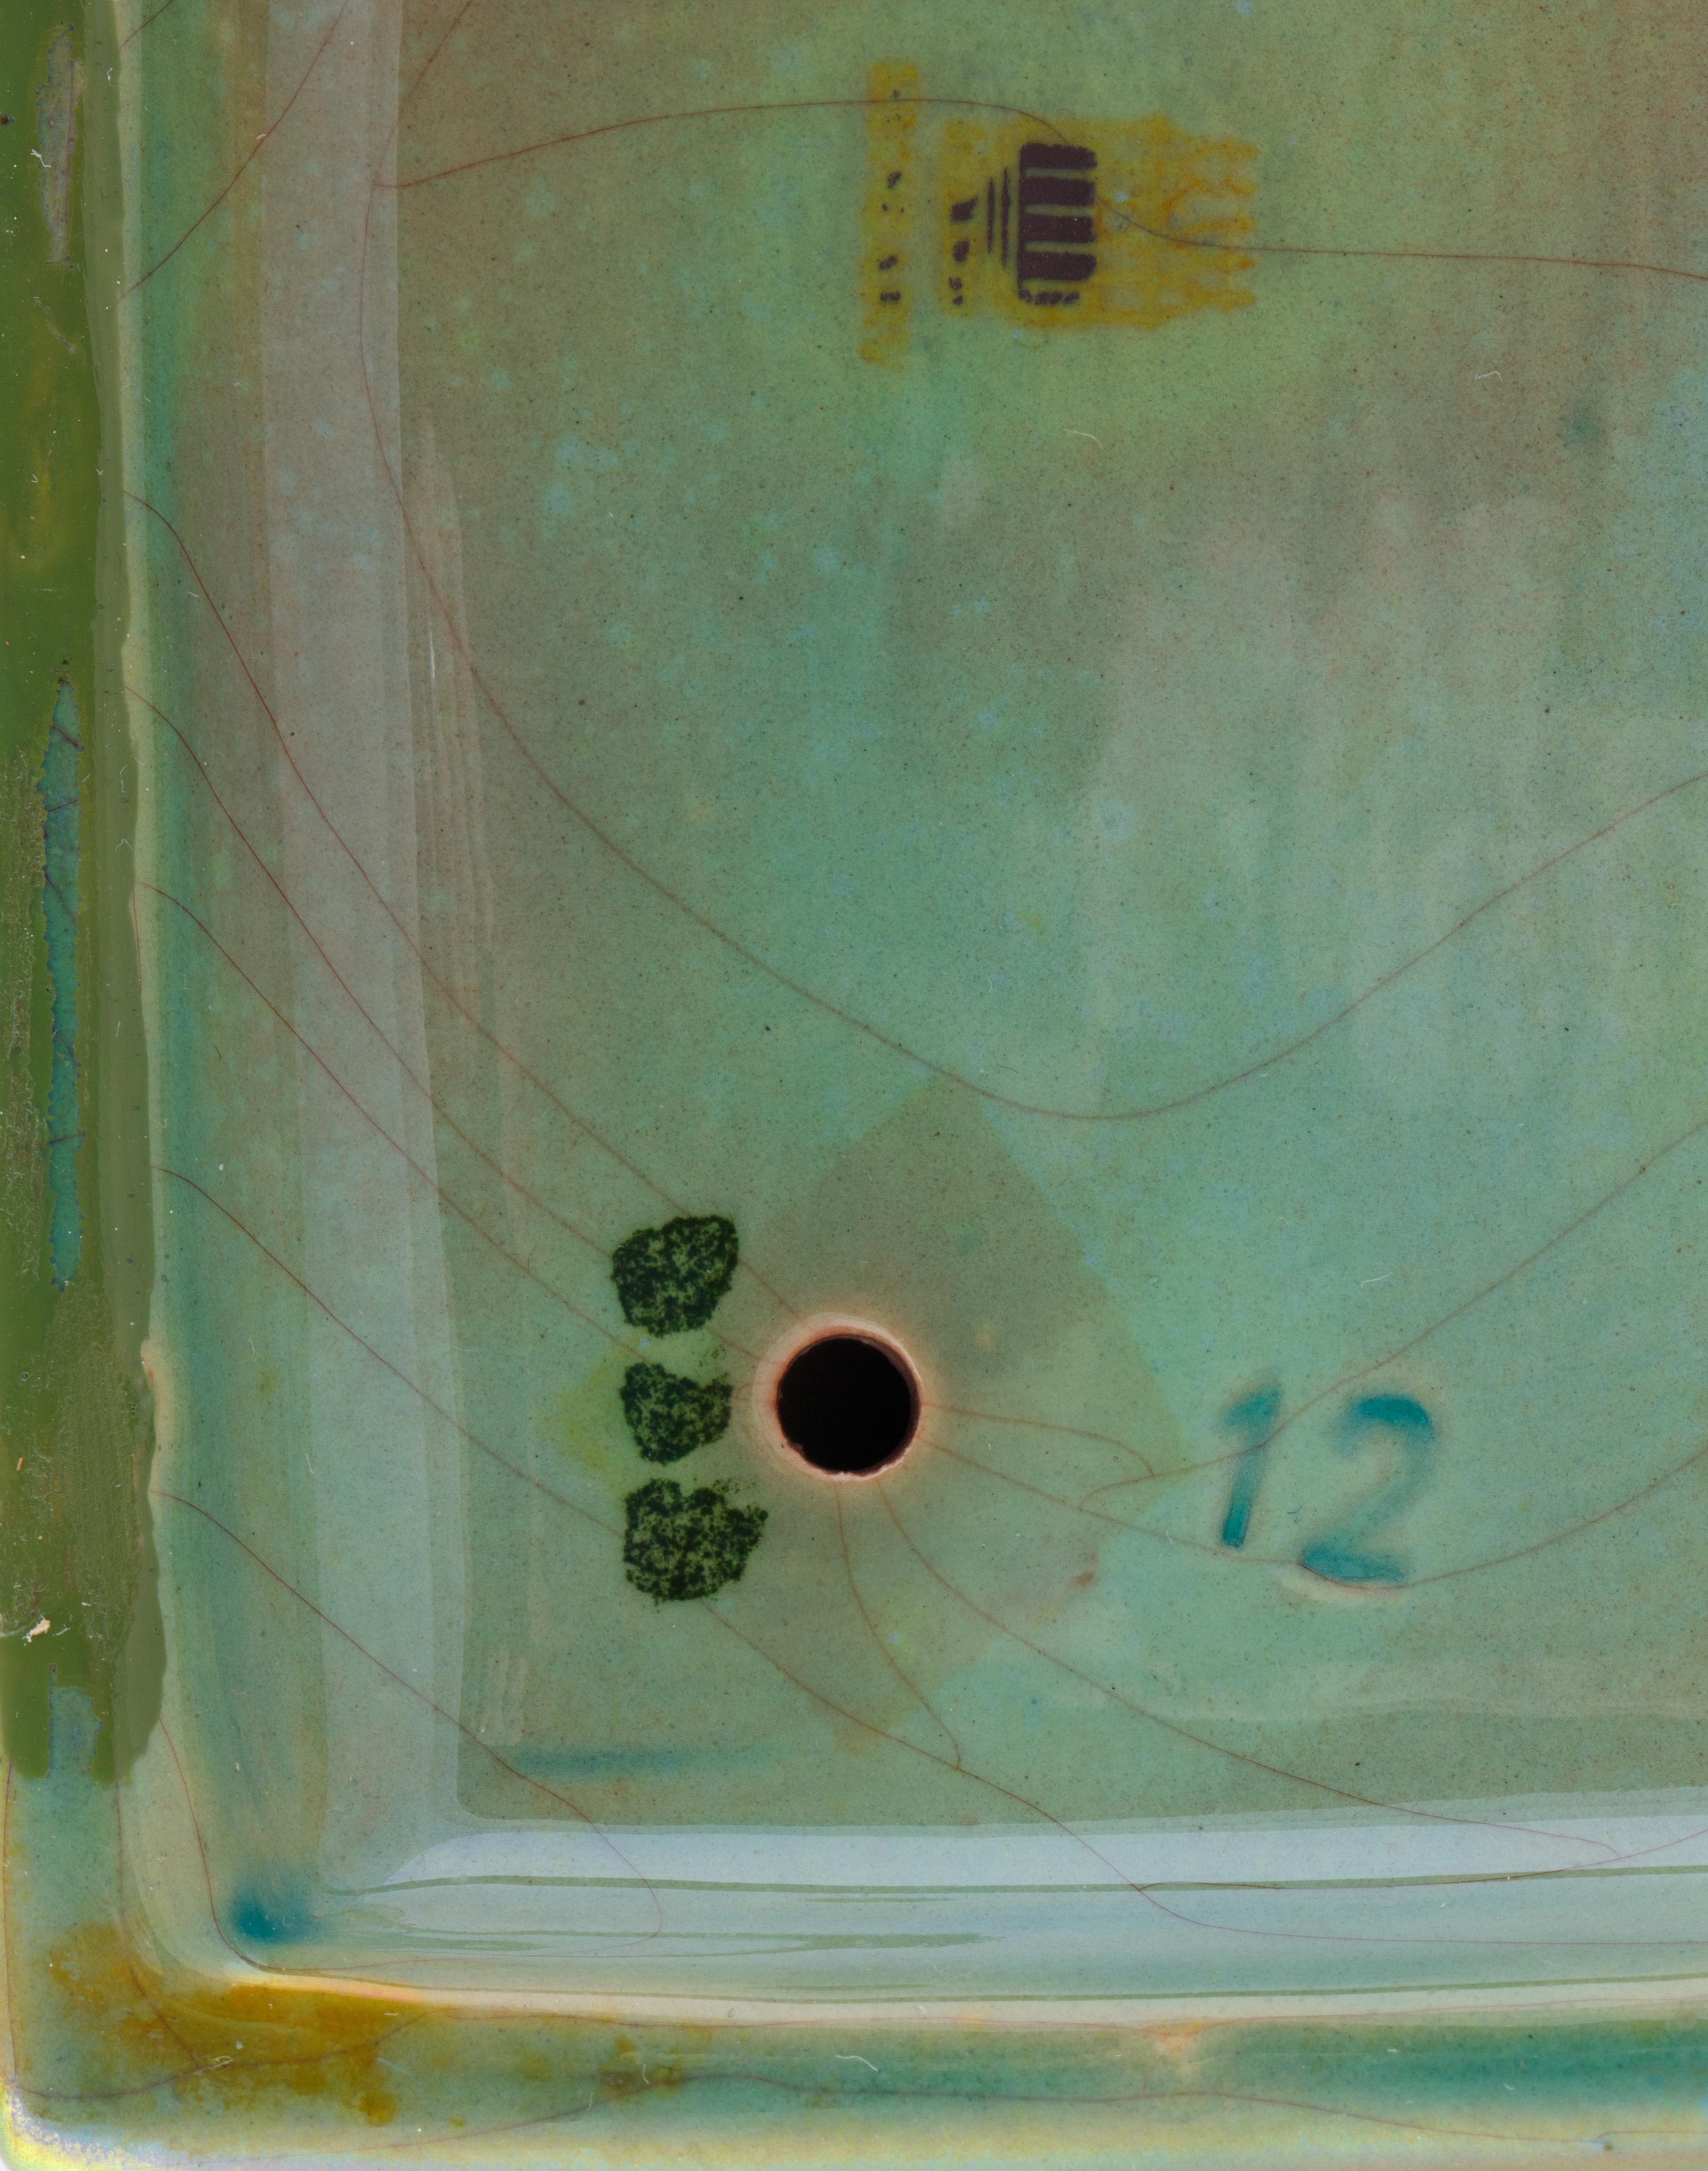 THREE ZSOLNAY EOSIN-GLAZED FIGURINES - Image 11 of 15